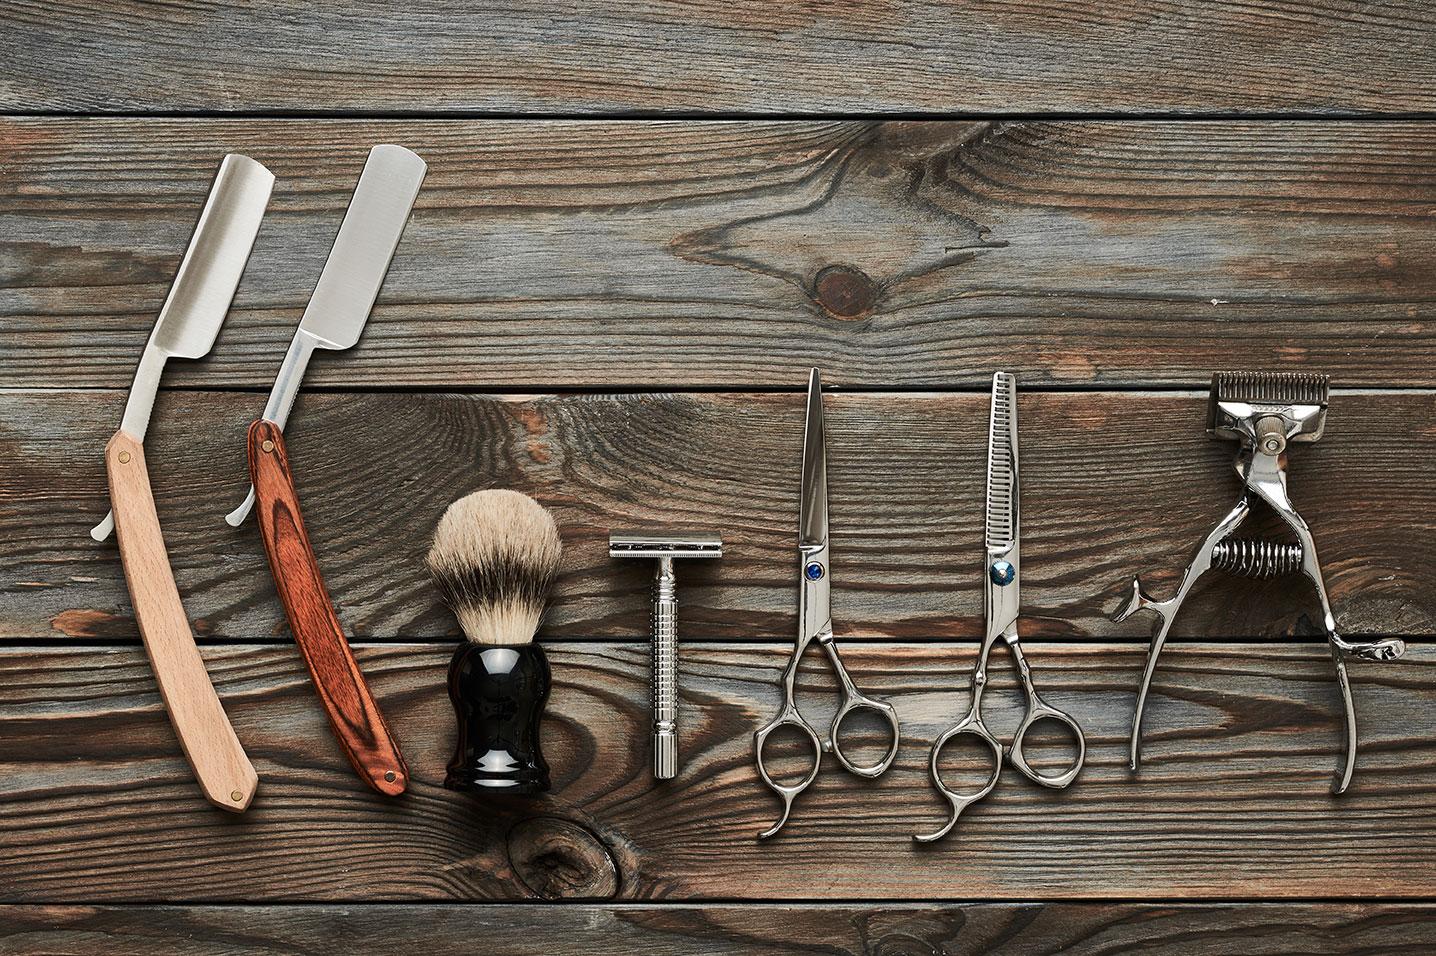 barber-shop-tools-on-wooden-background-PBHC3HU.jpg